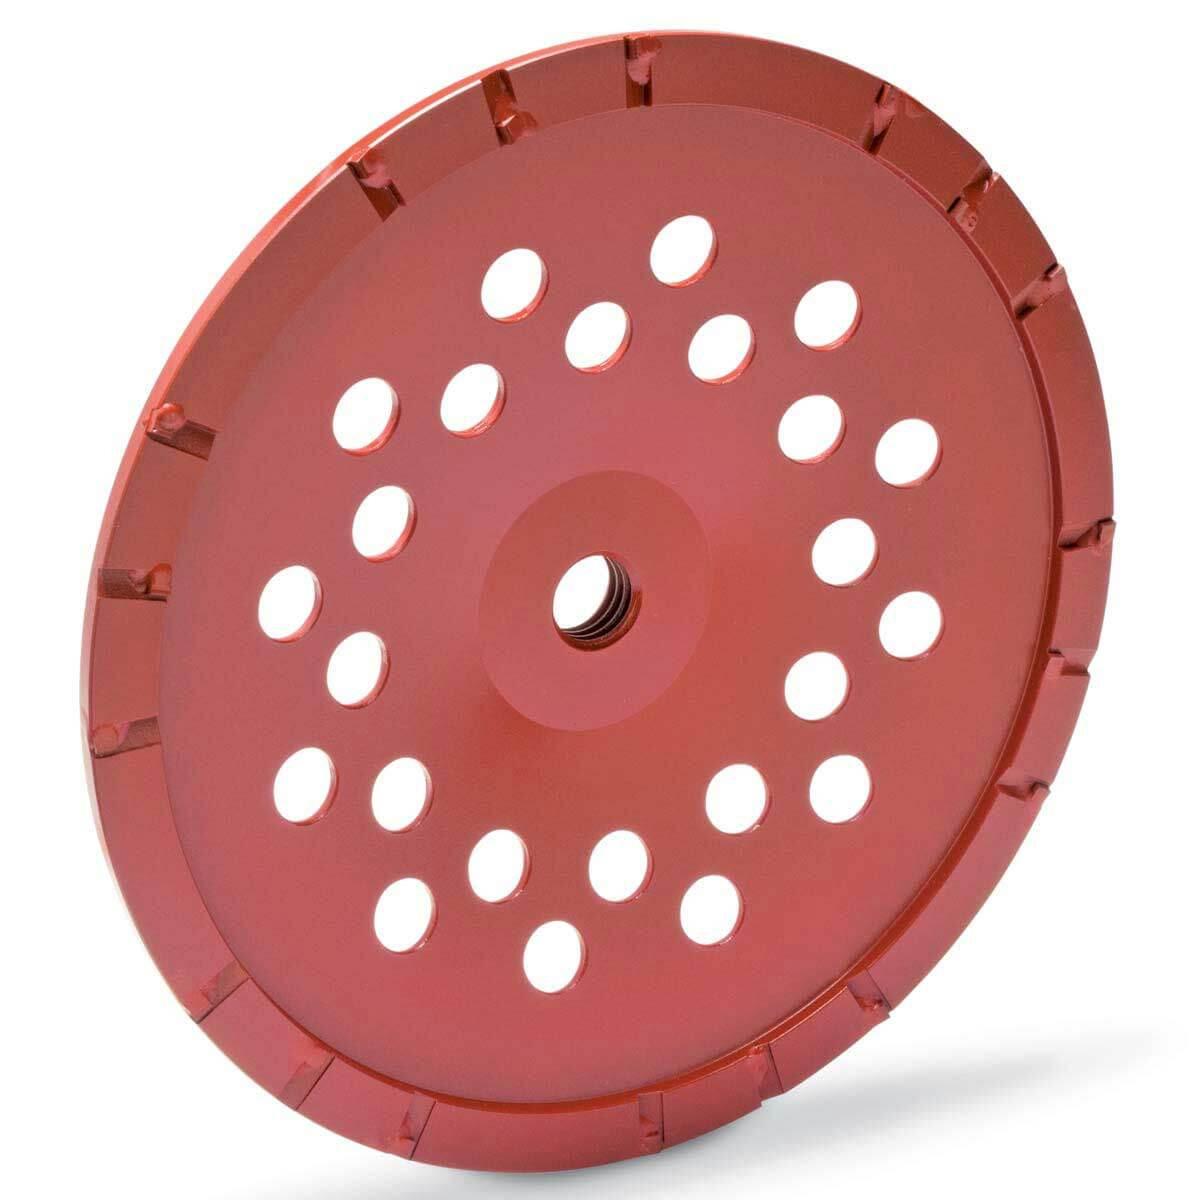 MK-604SG-2 Double Row PCD Cup Wheel